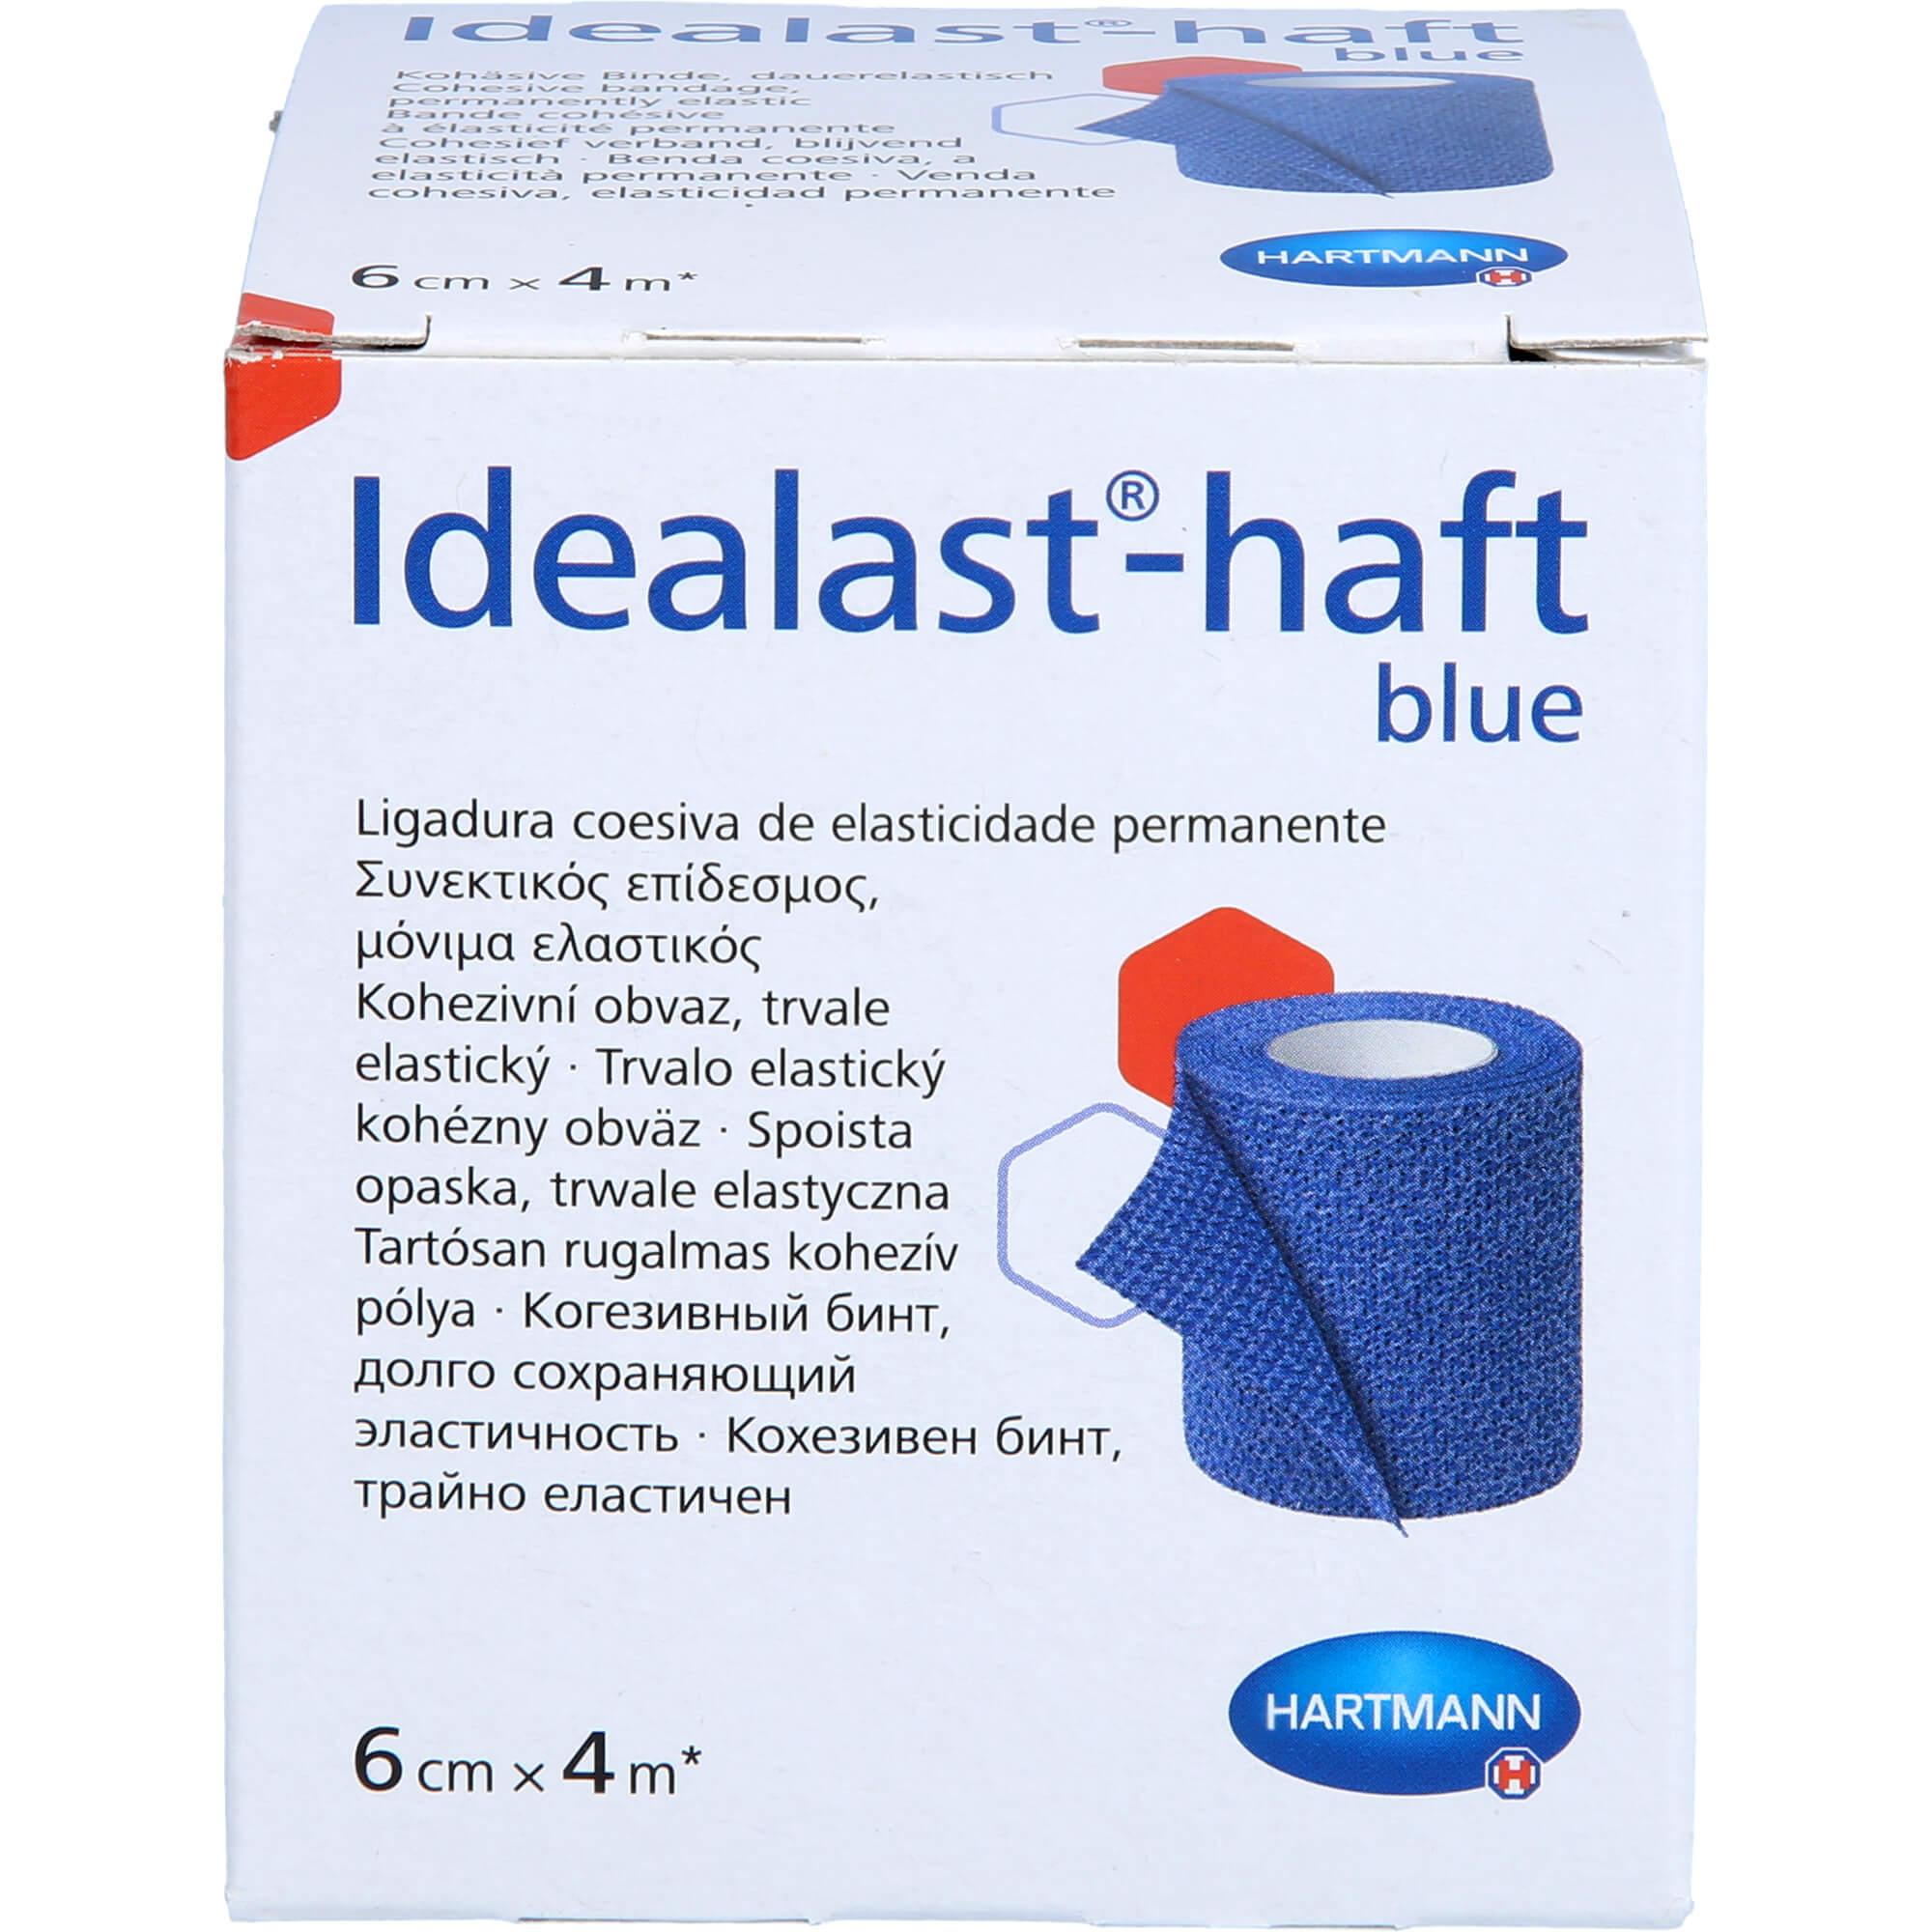 IDEALAST-haft color Binde 6 cmx4 m blau